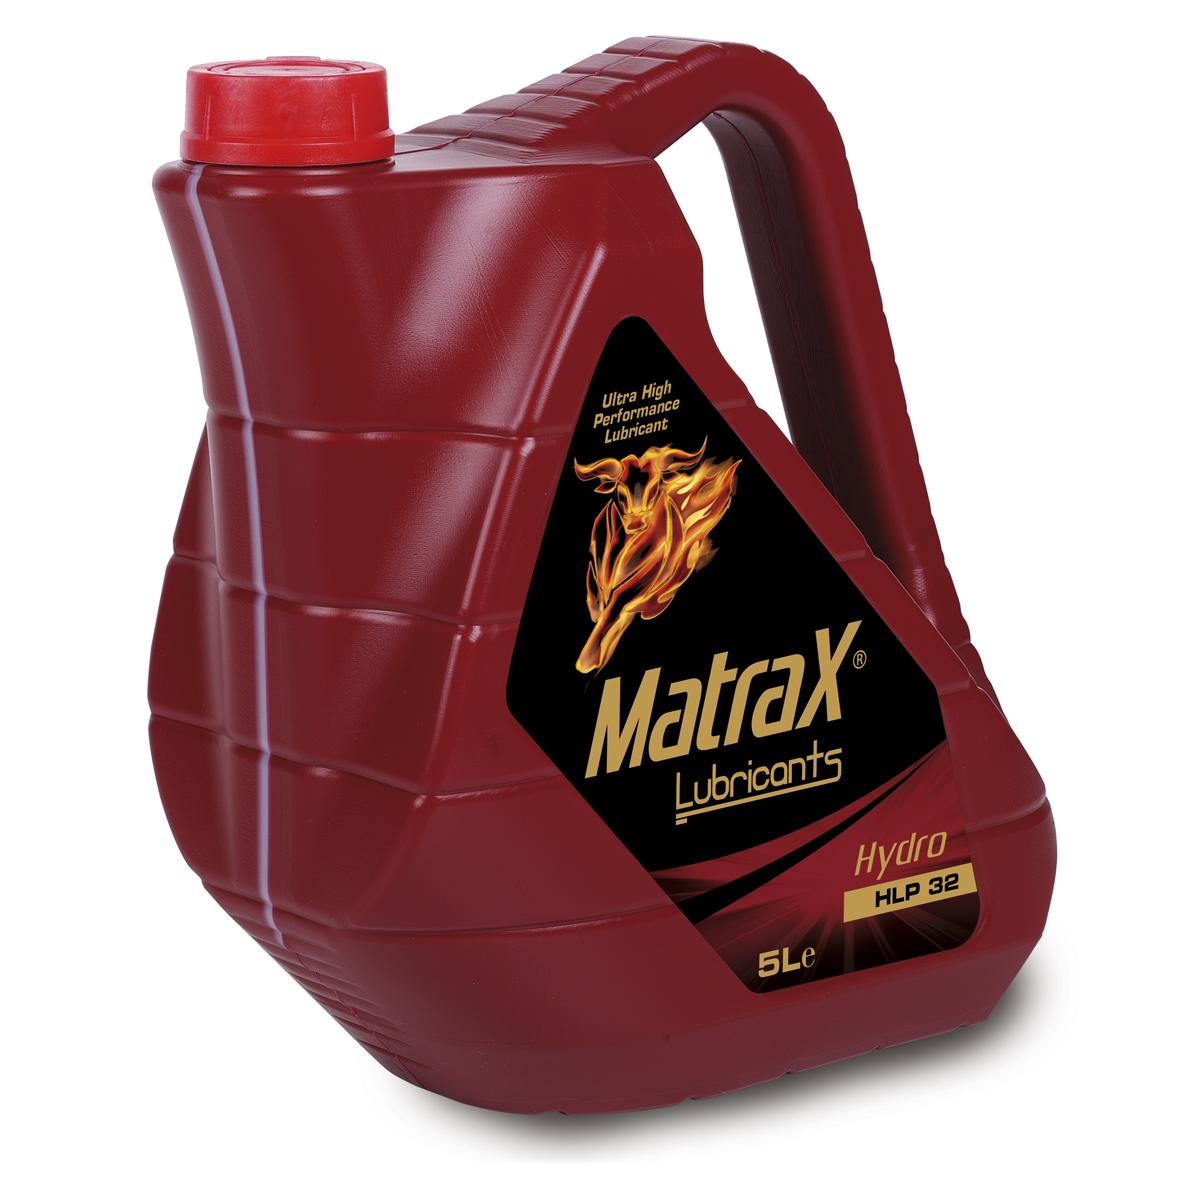 MatraX Hydro HLP 32